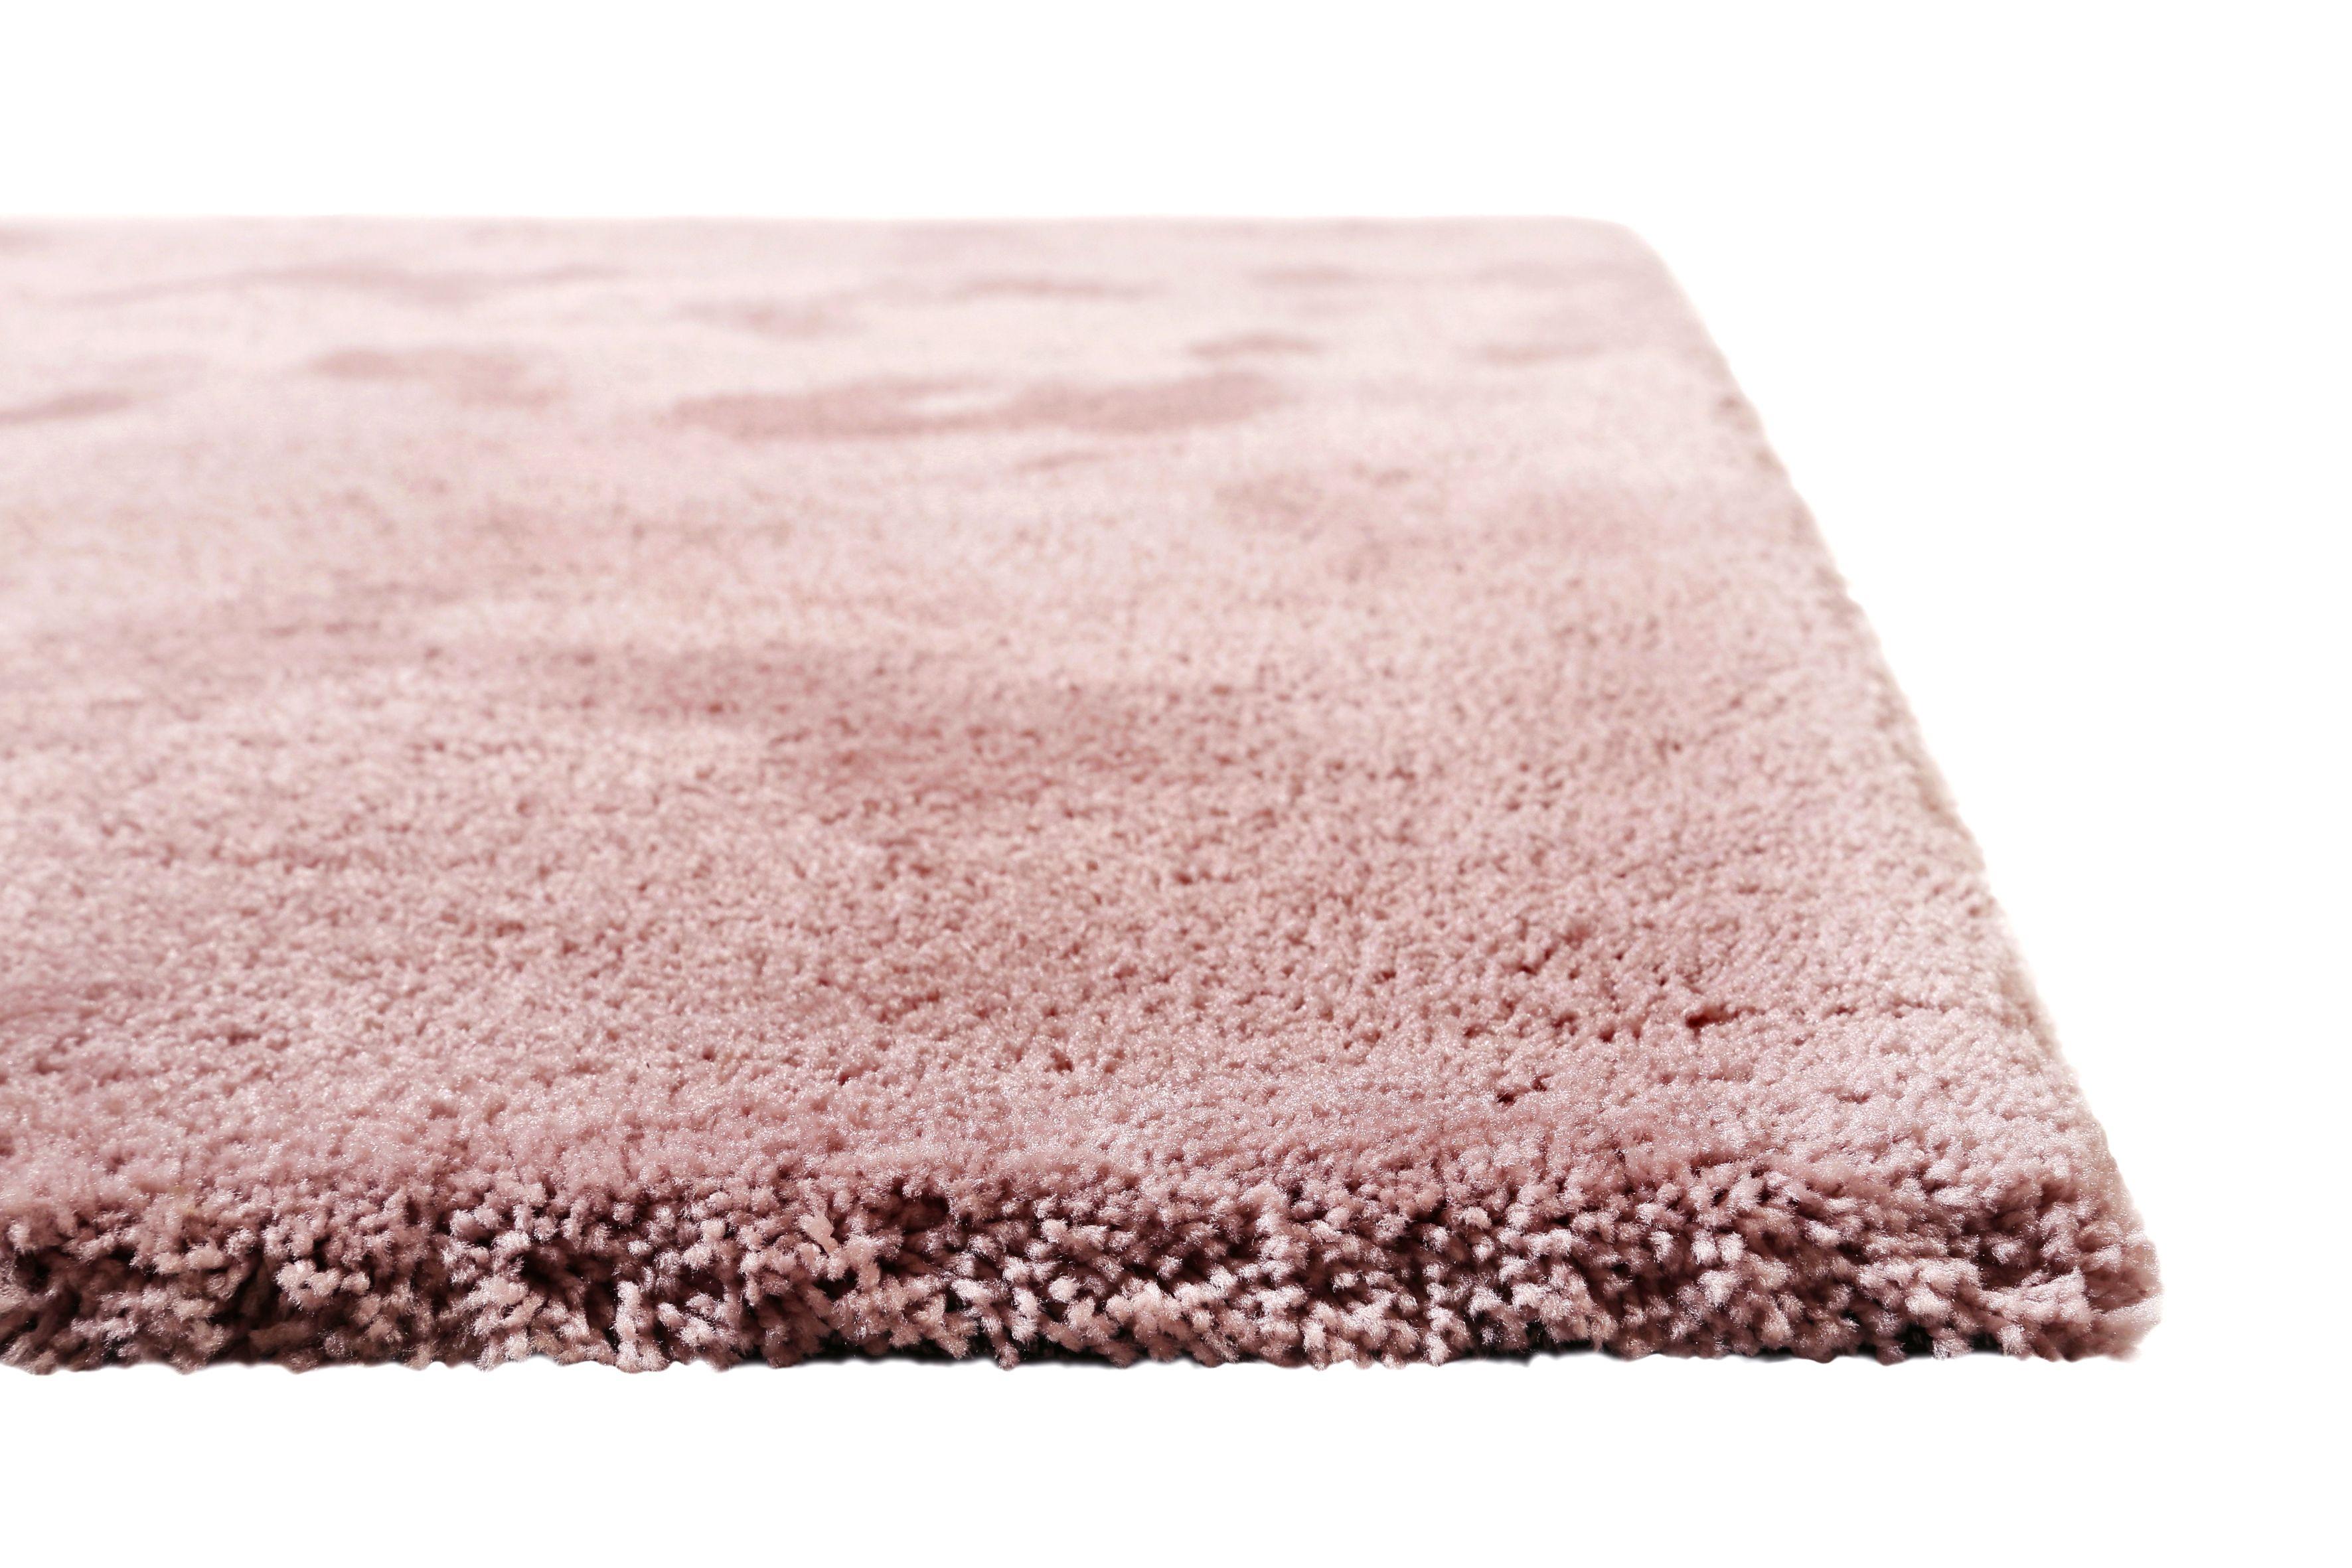 Homie Living Hochflor Teppich Pisa Rosa Hochflor Teppich Teppich Vintage Teppiche